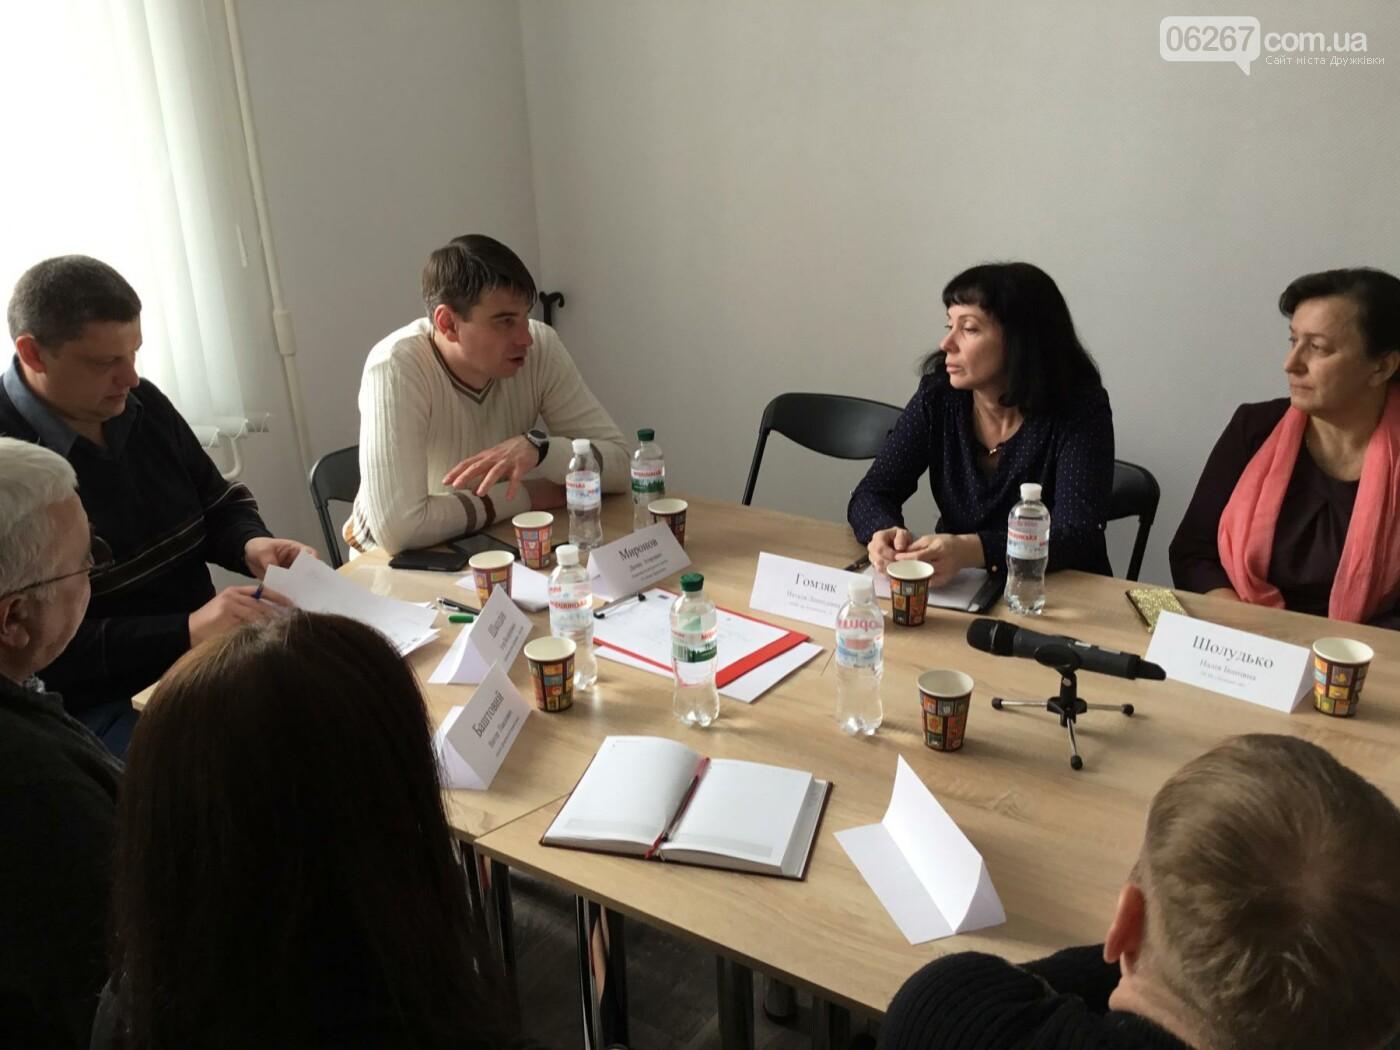 В Дружковке обсудили проблемы развития ОСМД в городе и области (ФОТО, ВИДЕО), фото-3